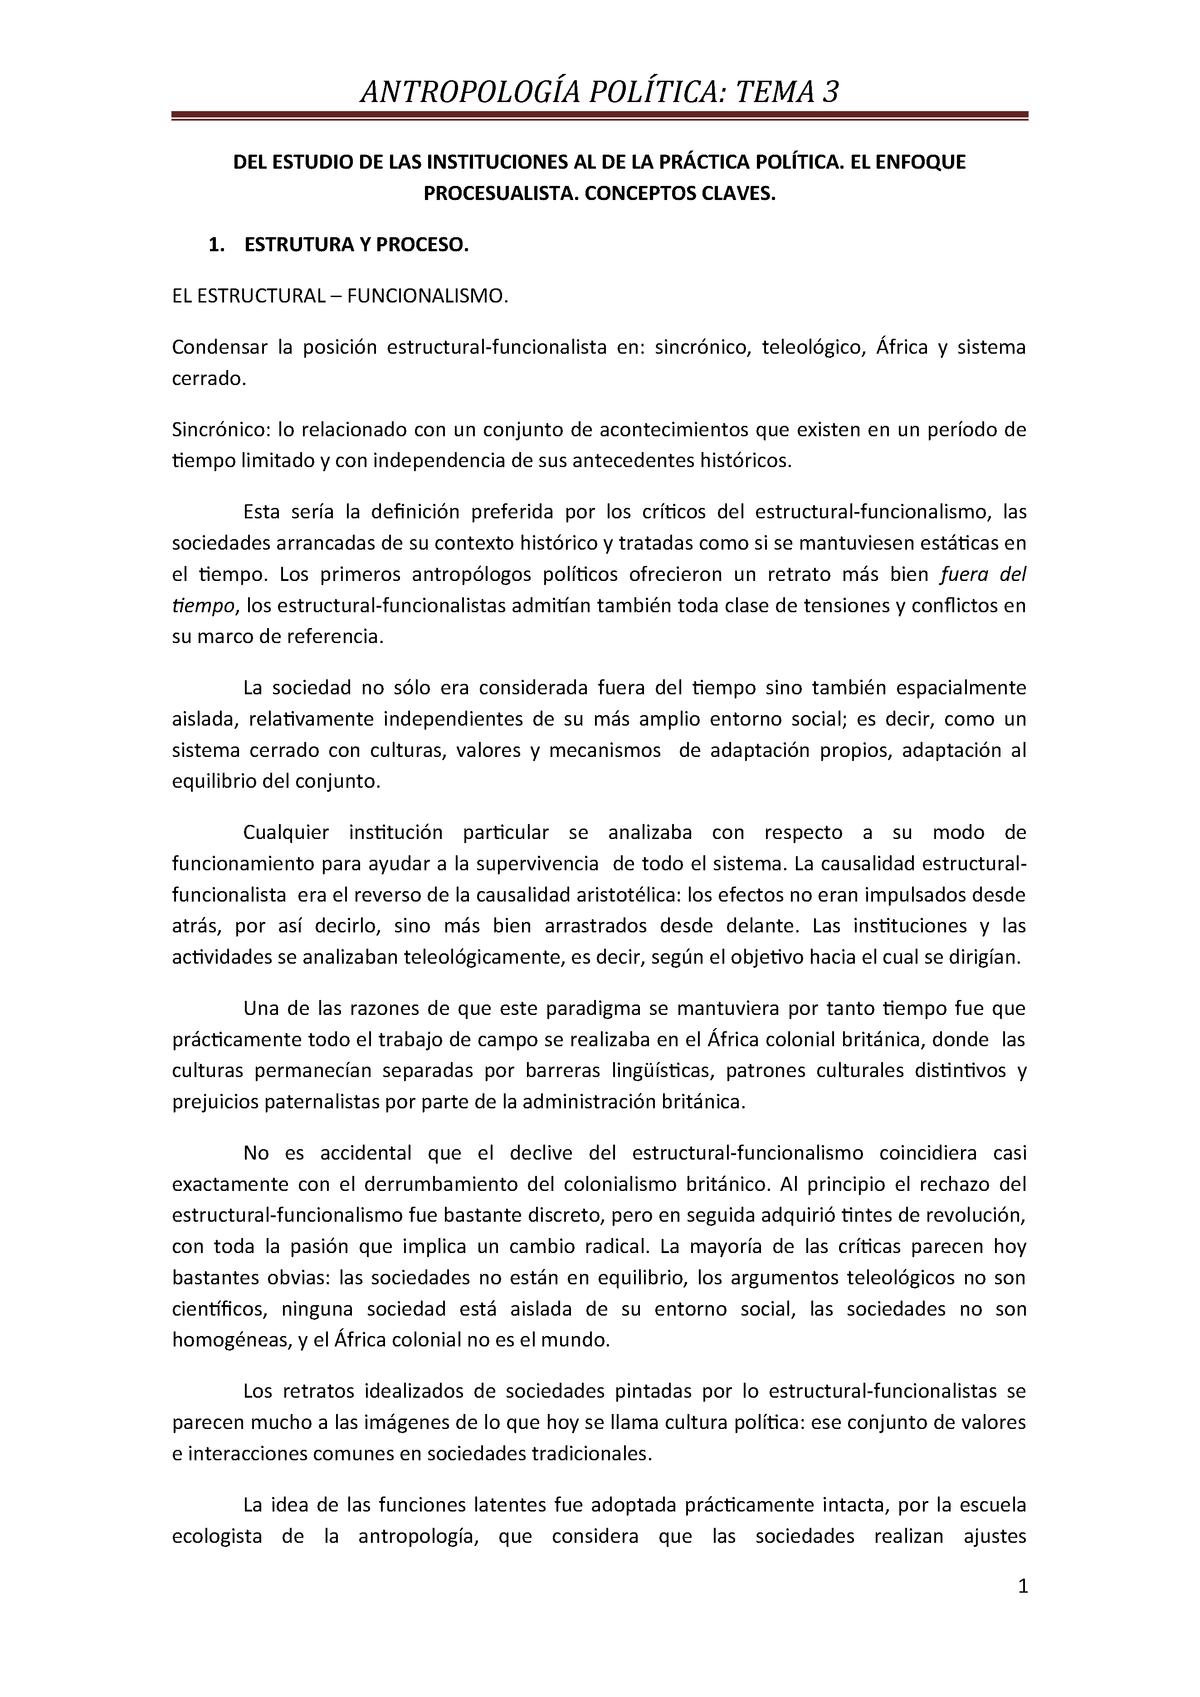 Tema 3 Apuntes 3 Antropologia Politica Uned Studocu